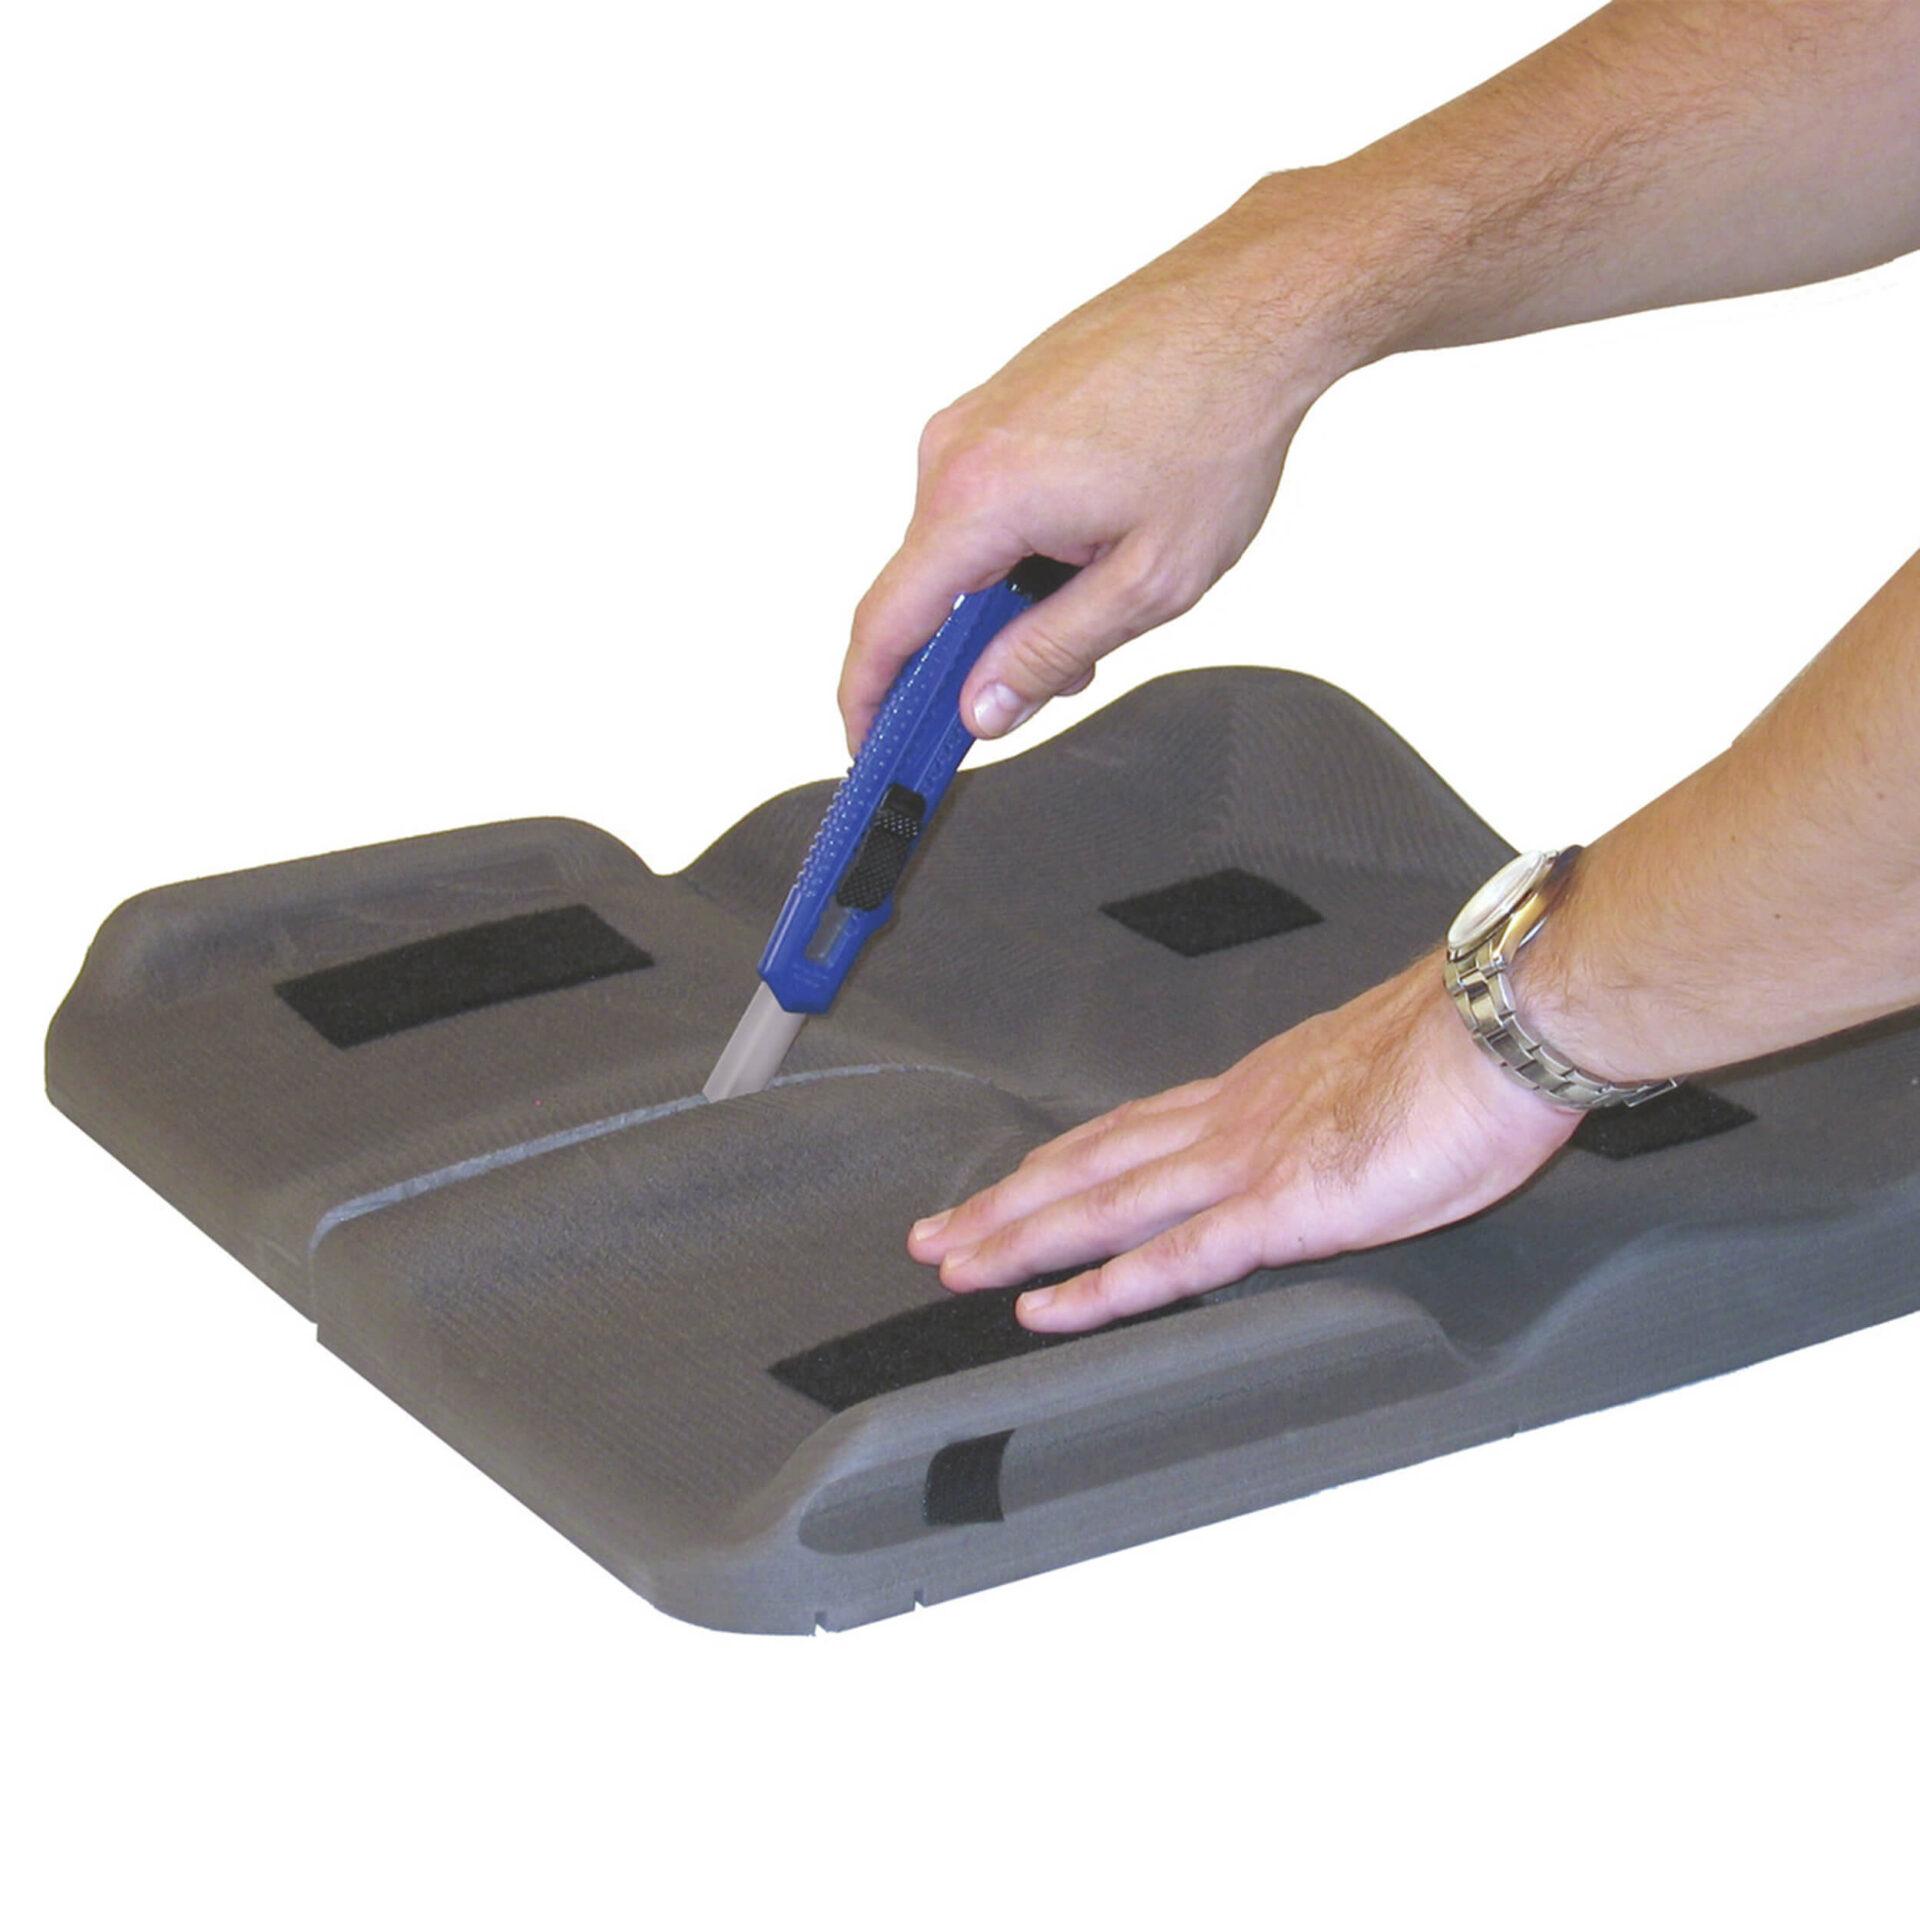 Modifying contour base of Wheelchair Pressure Cushion